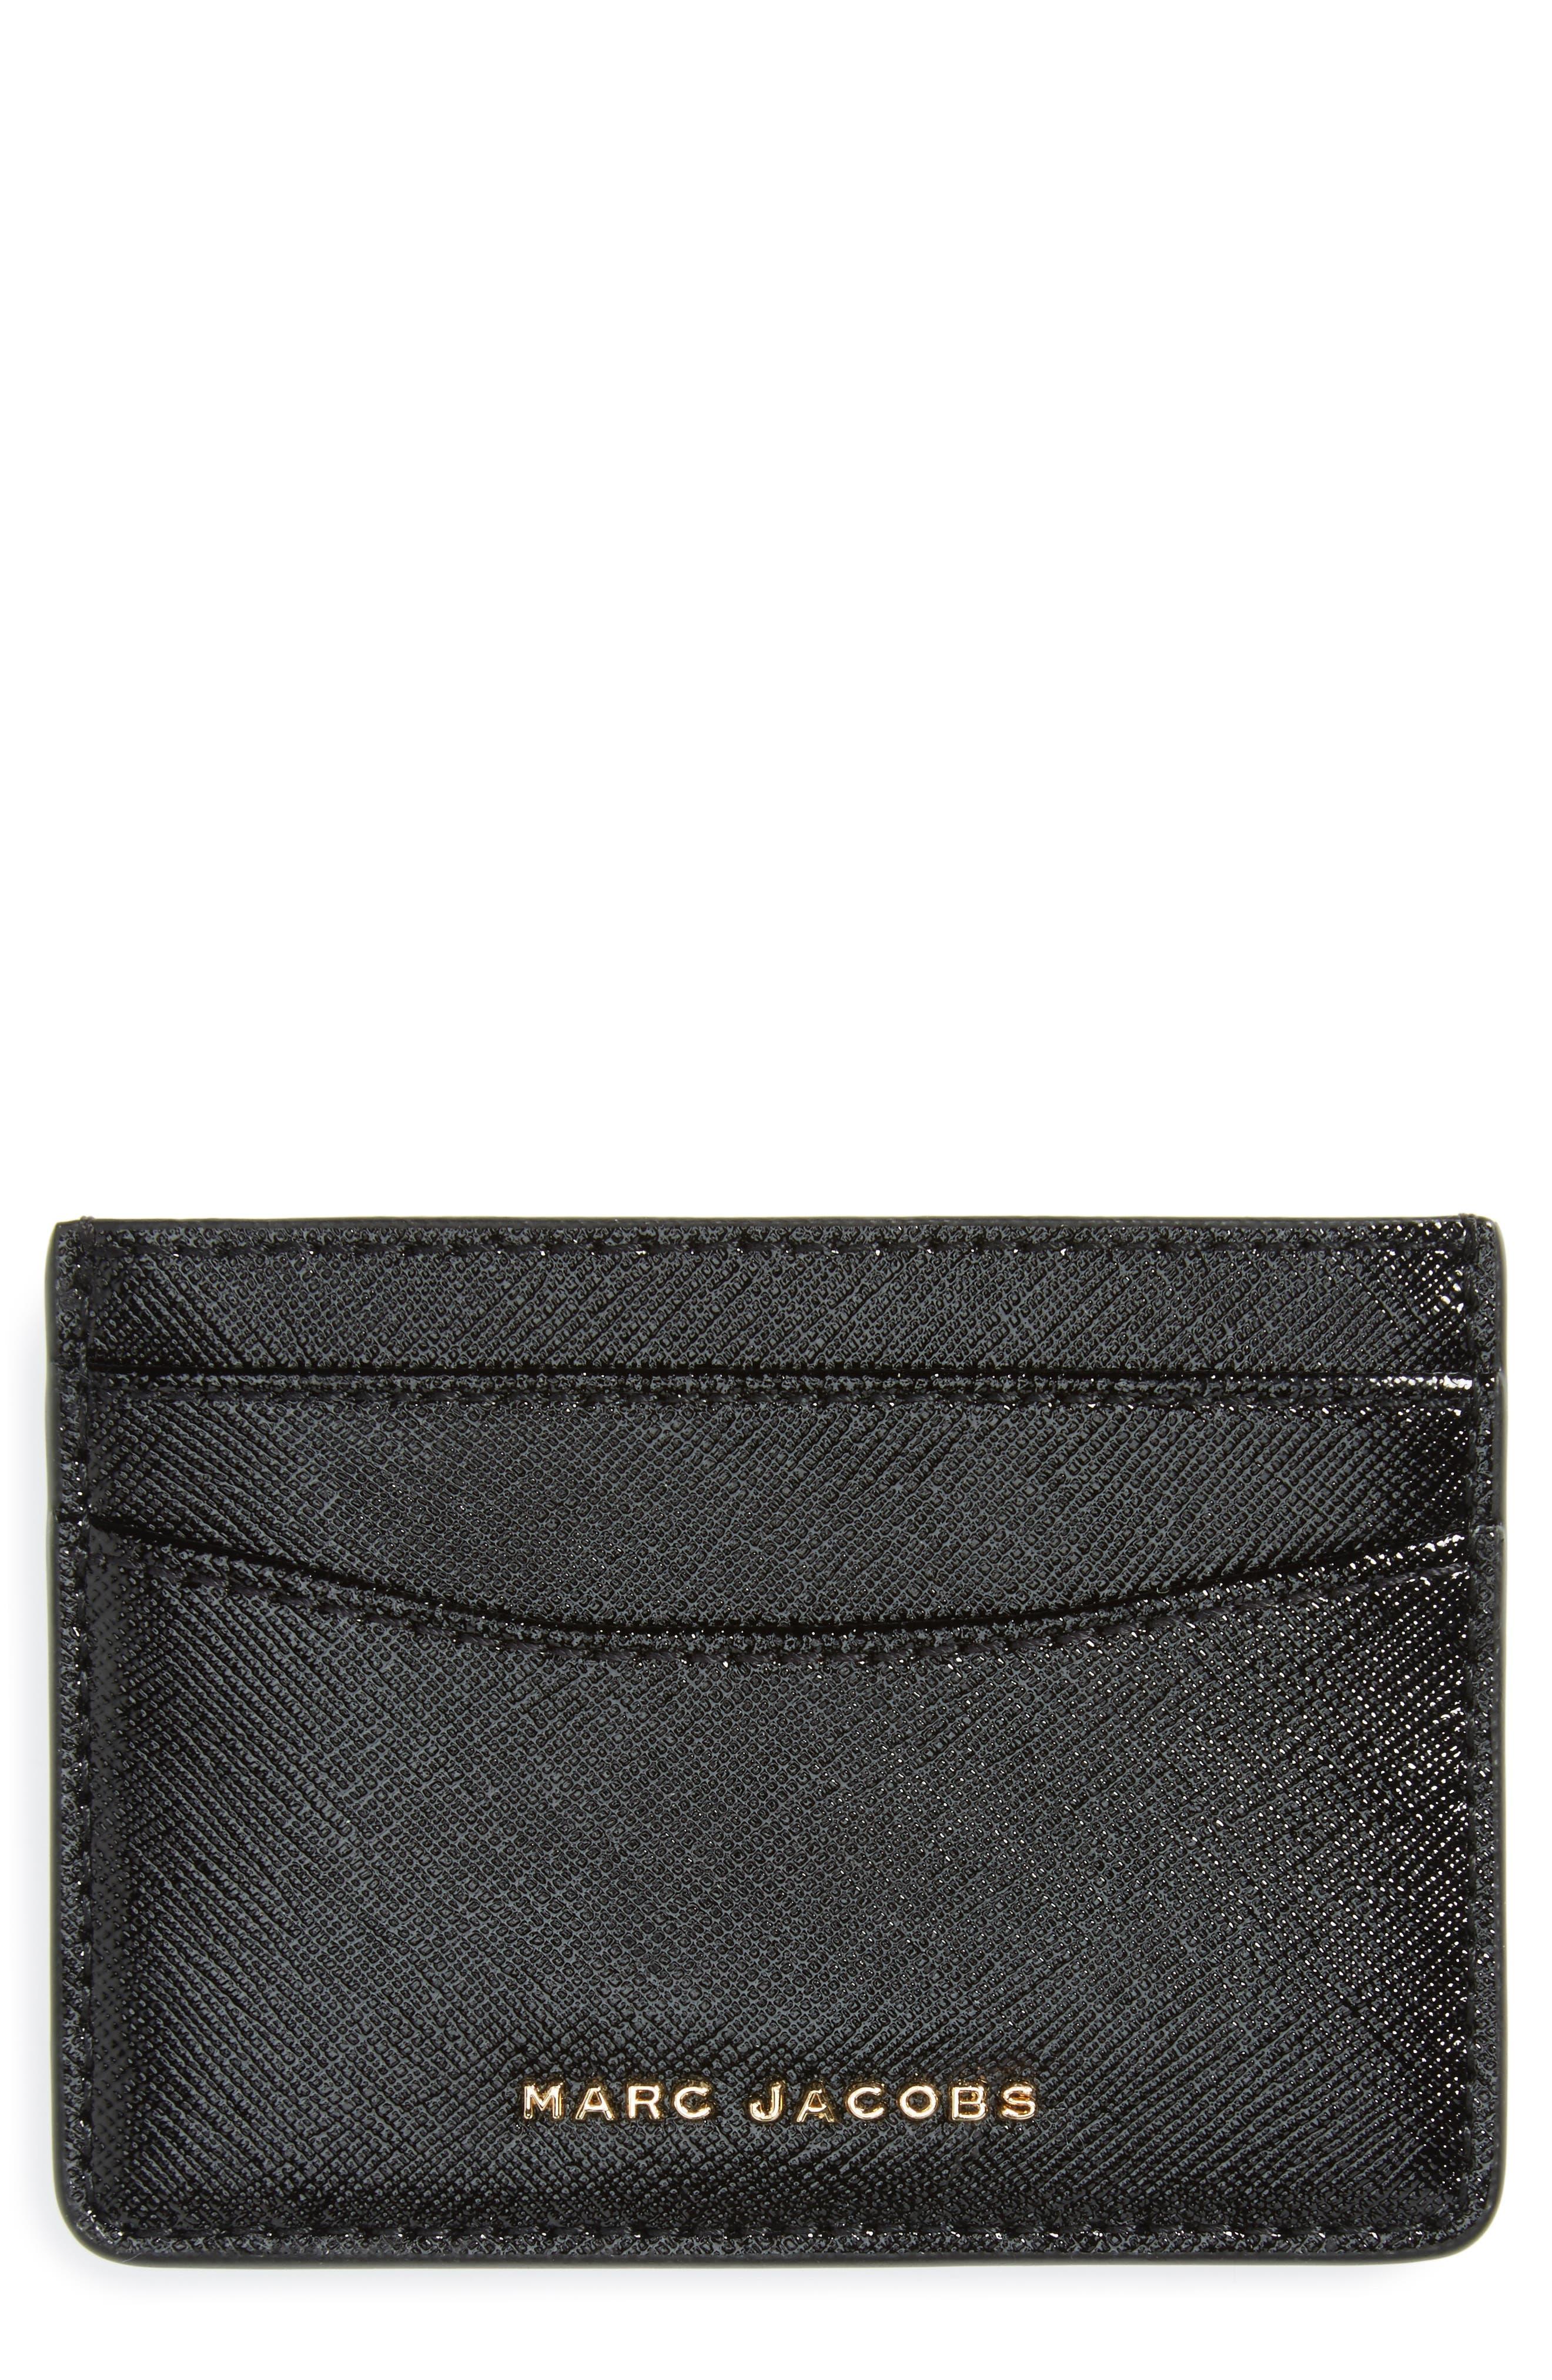 Color Block Saffiano Leather Card Case,                         Main,                         color,